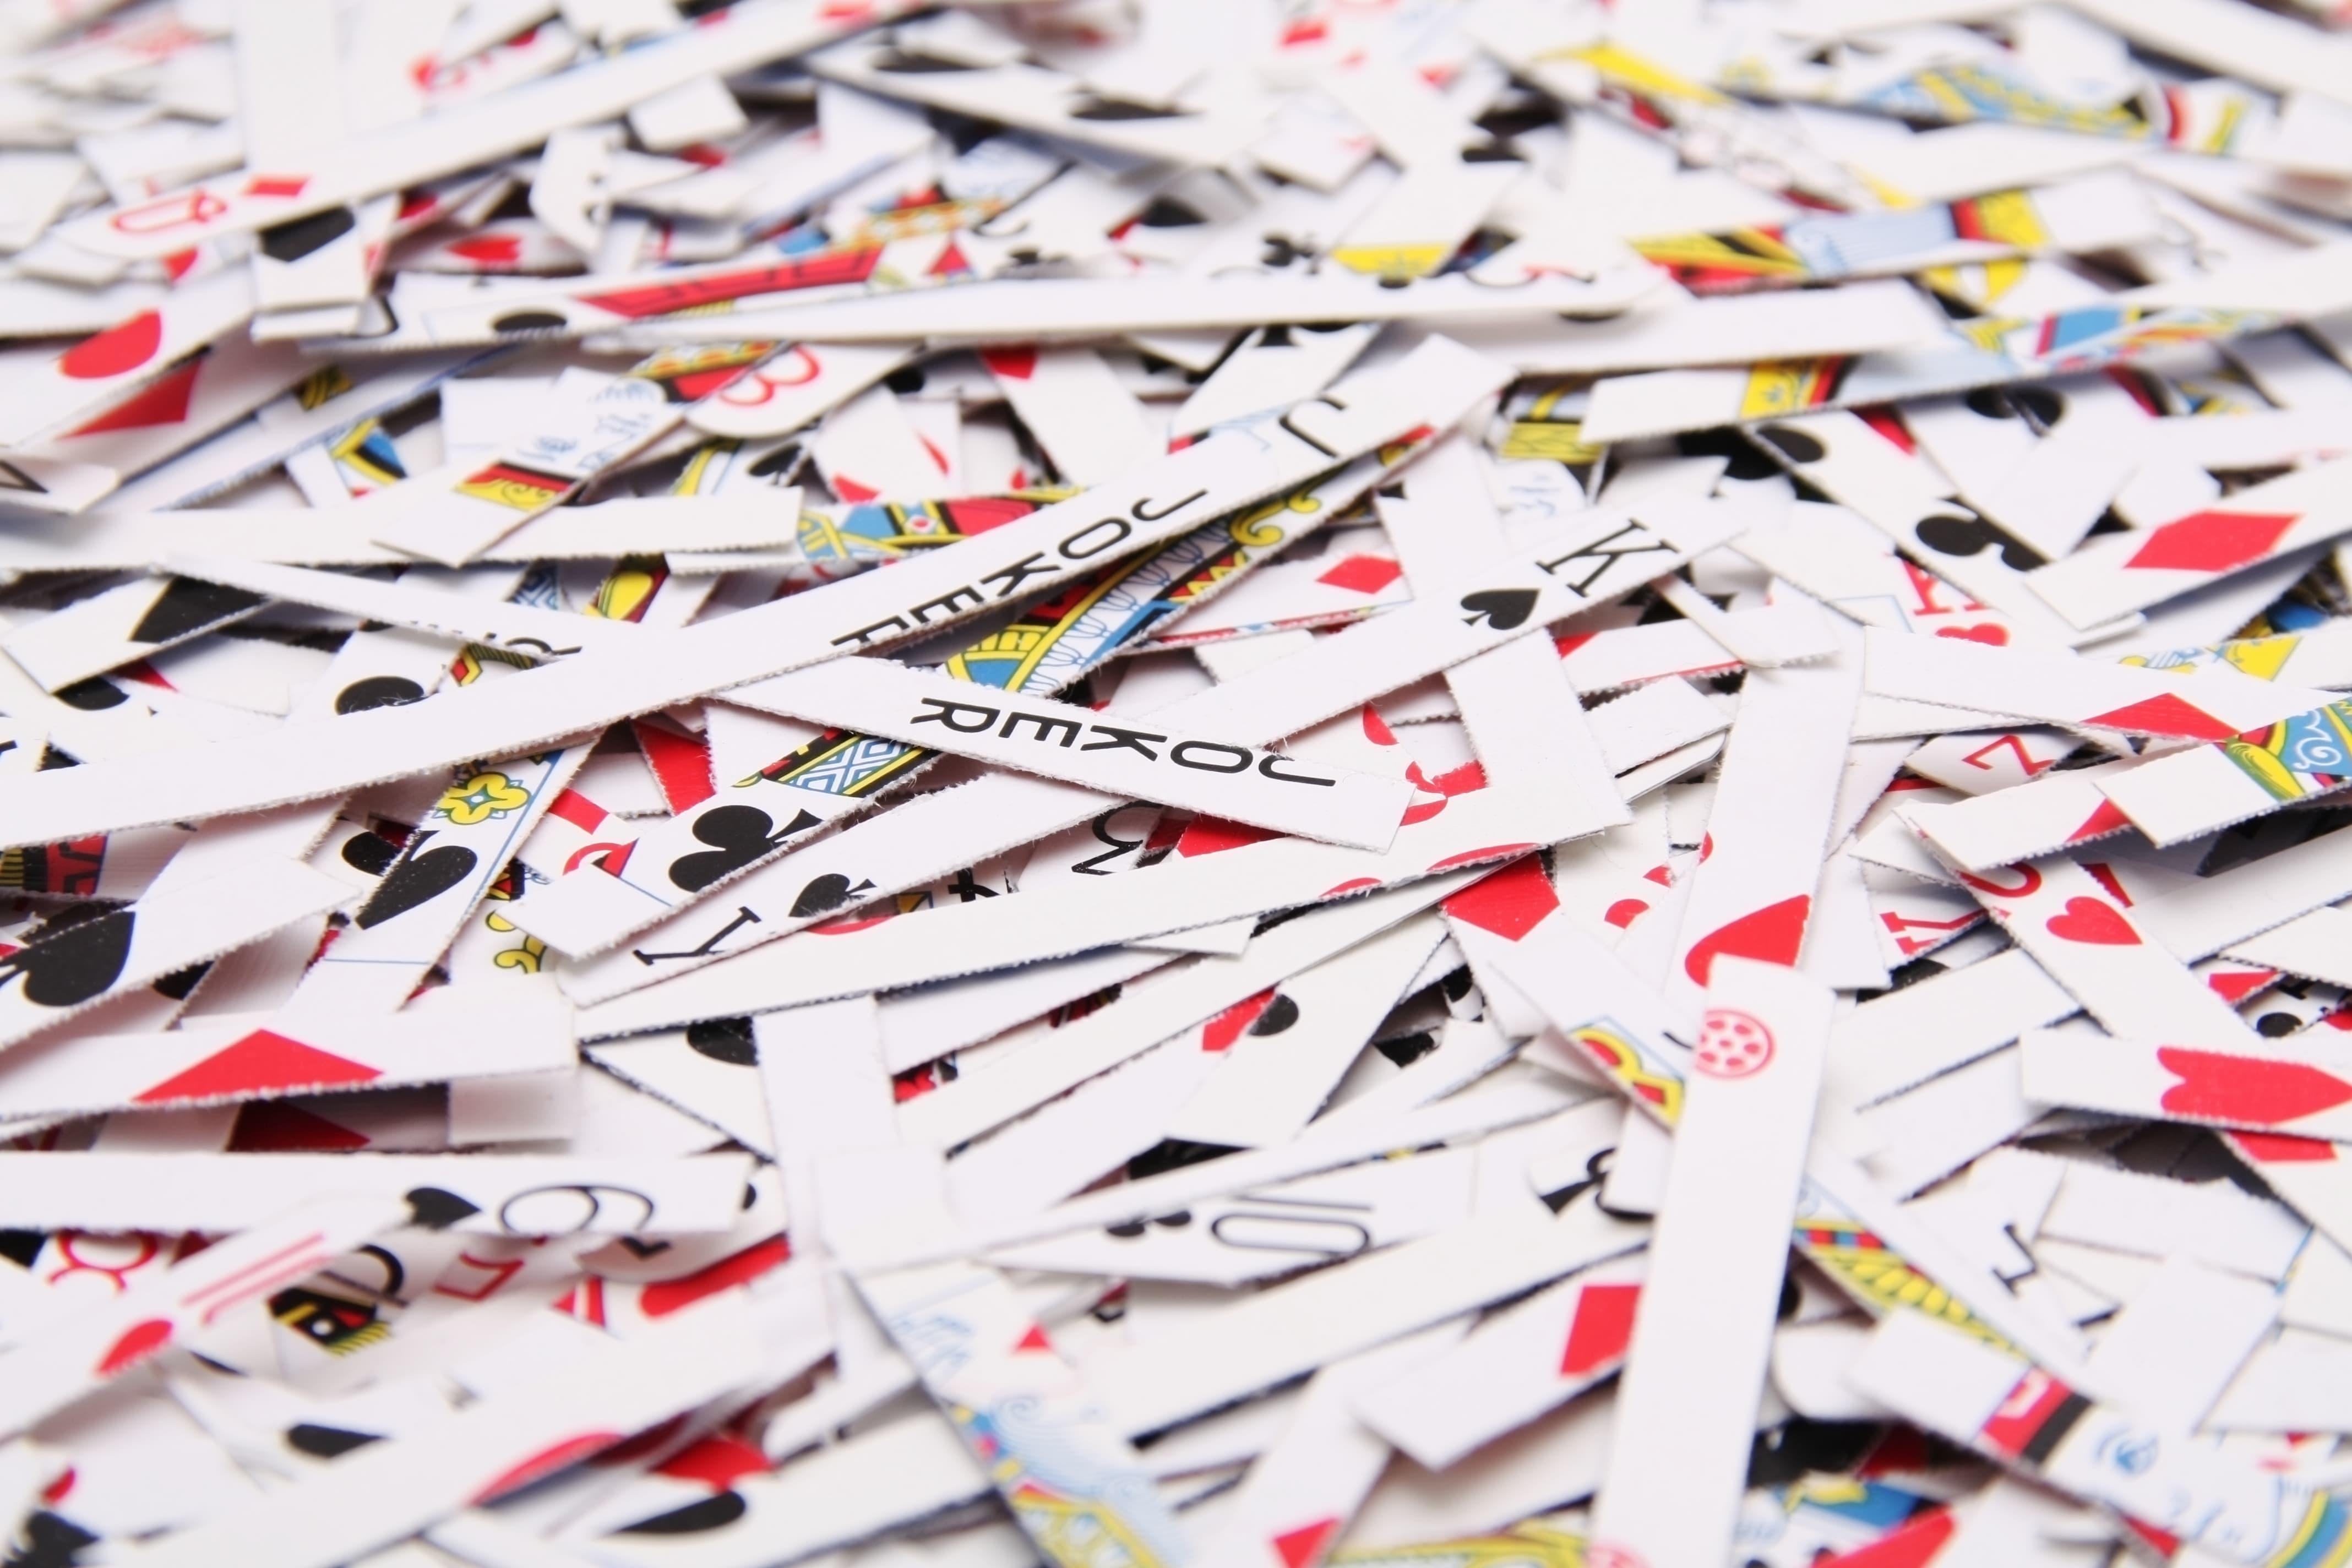 Casino Spielkarten geschreddert